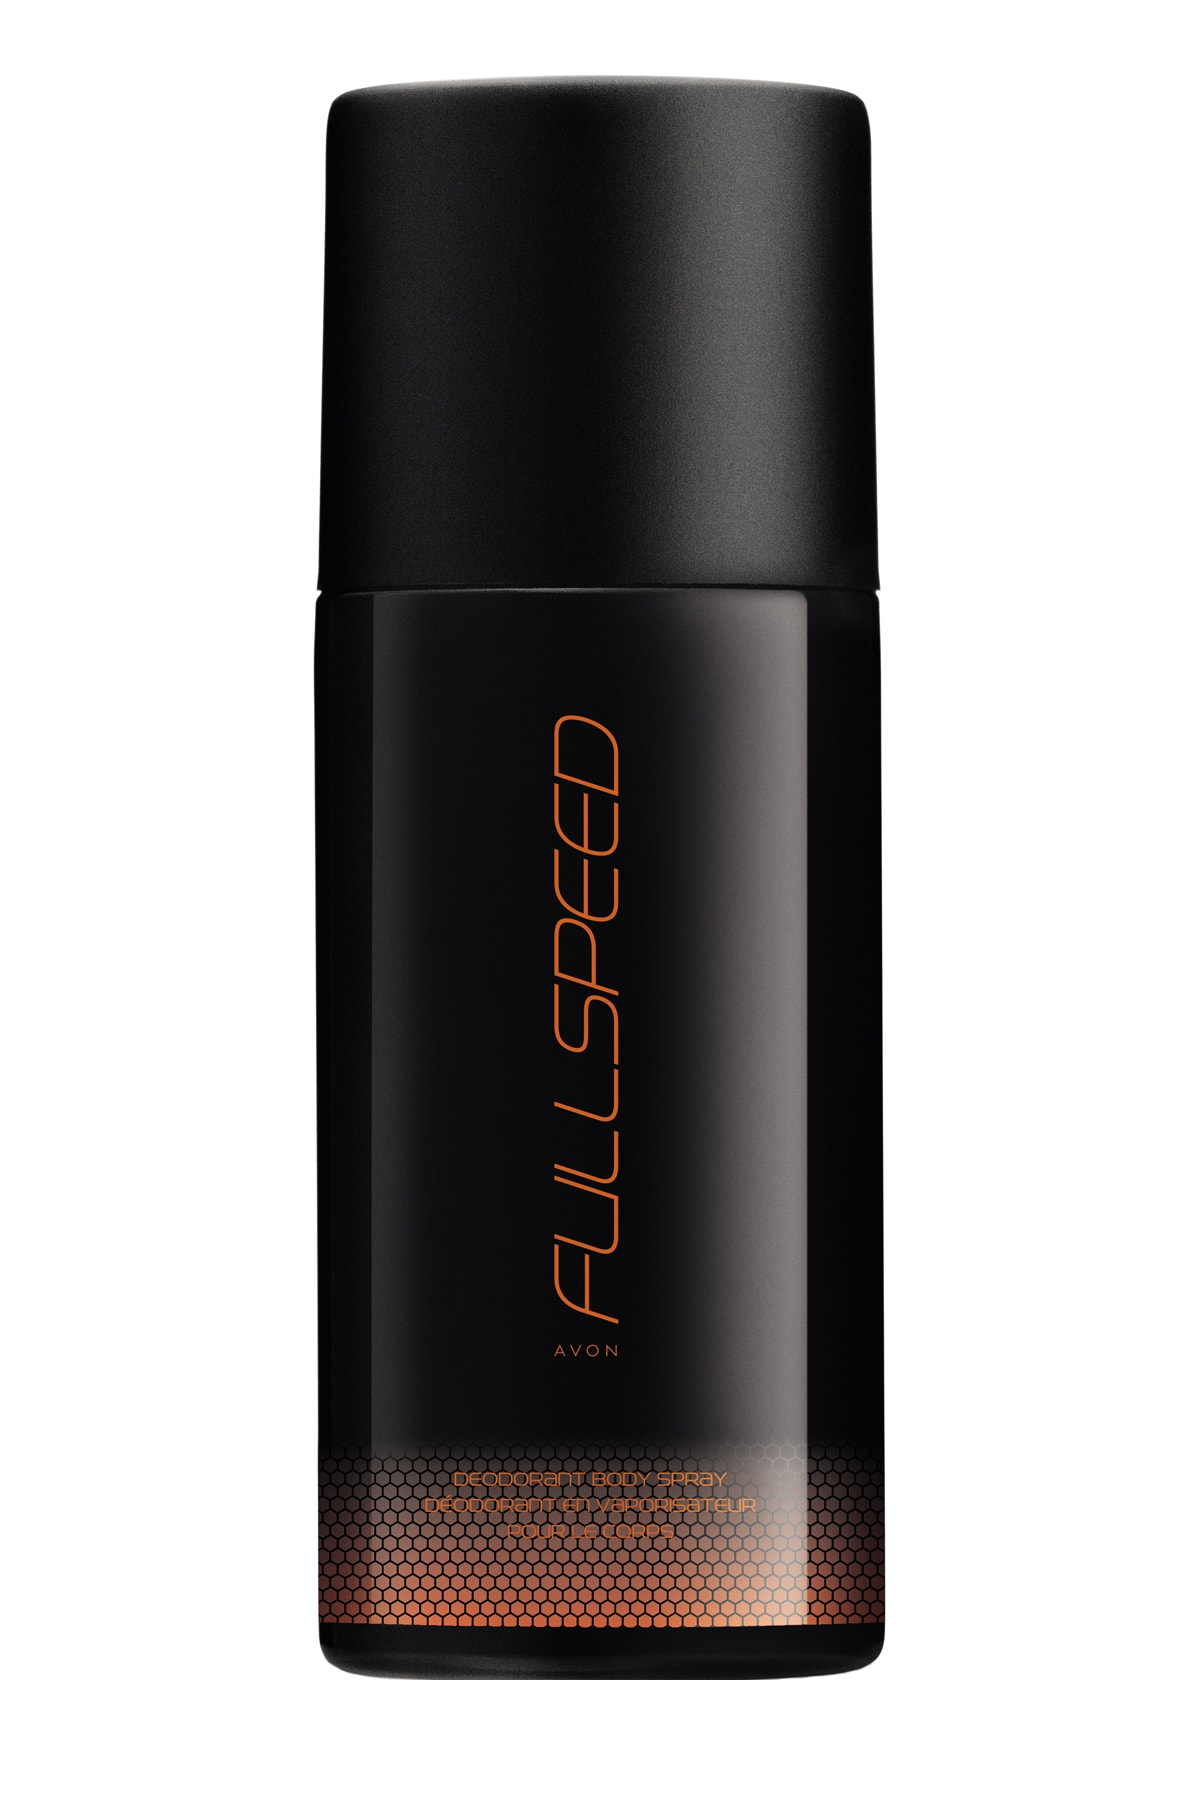 AVON Full Speed Erkek Deodorant 150 ml 8681298920021